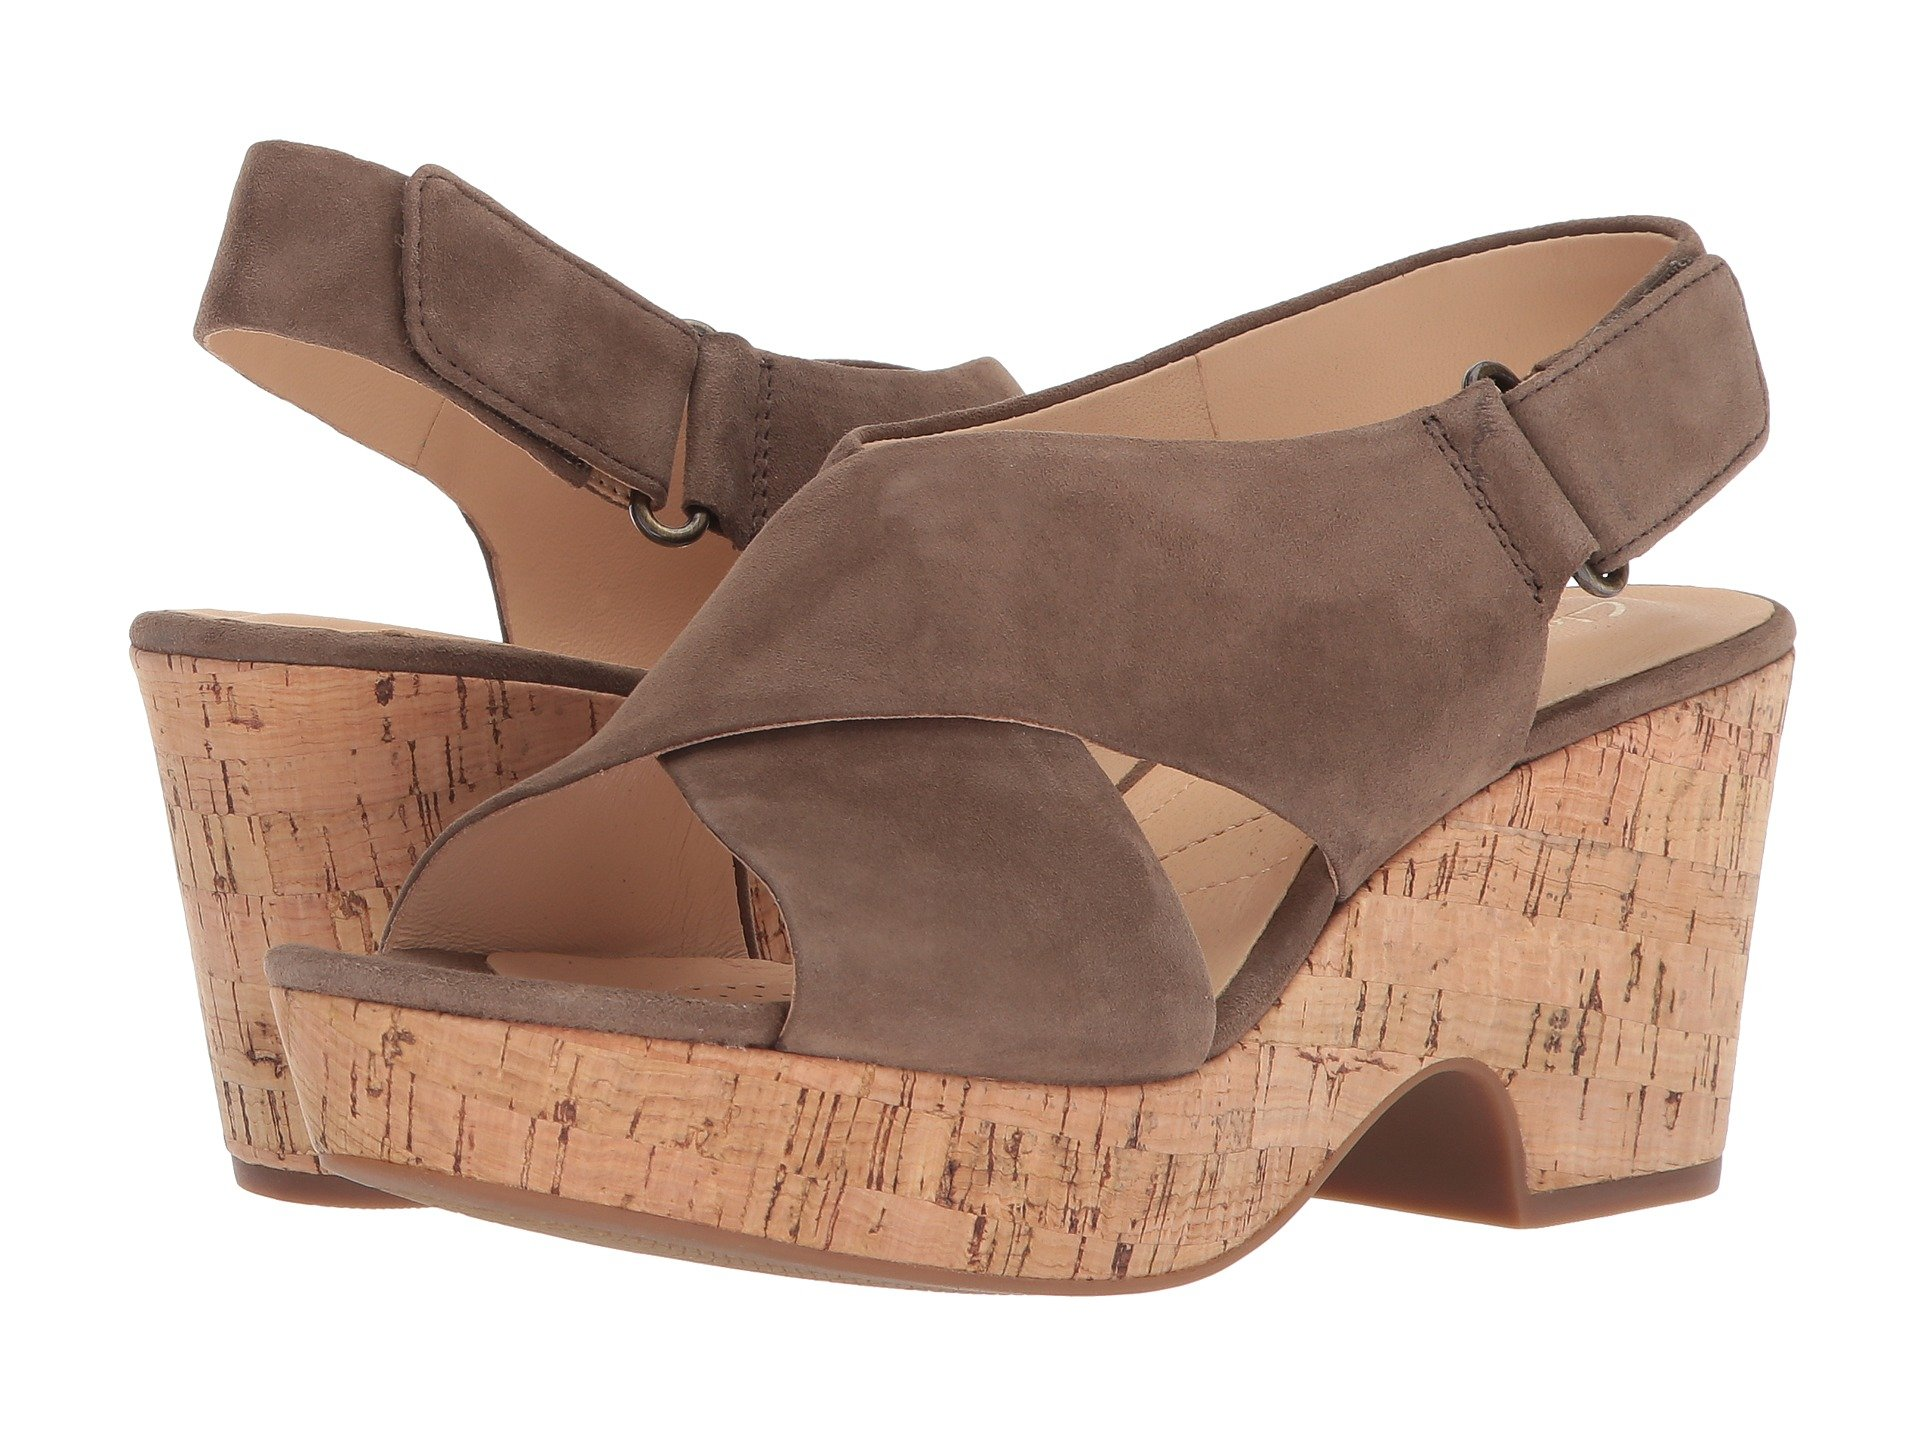 New Clarks Maritsa Lara Women's Wedge Shoes, Olive Suede/Cork